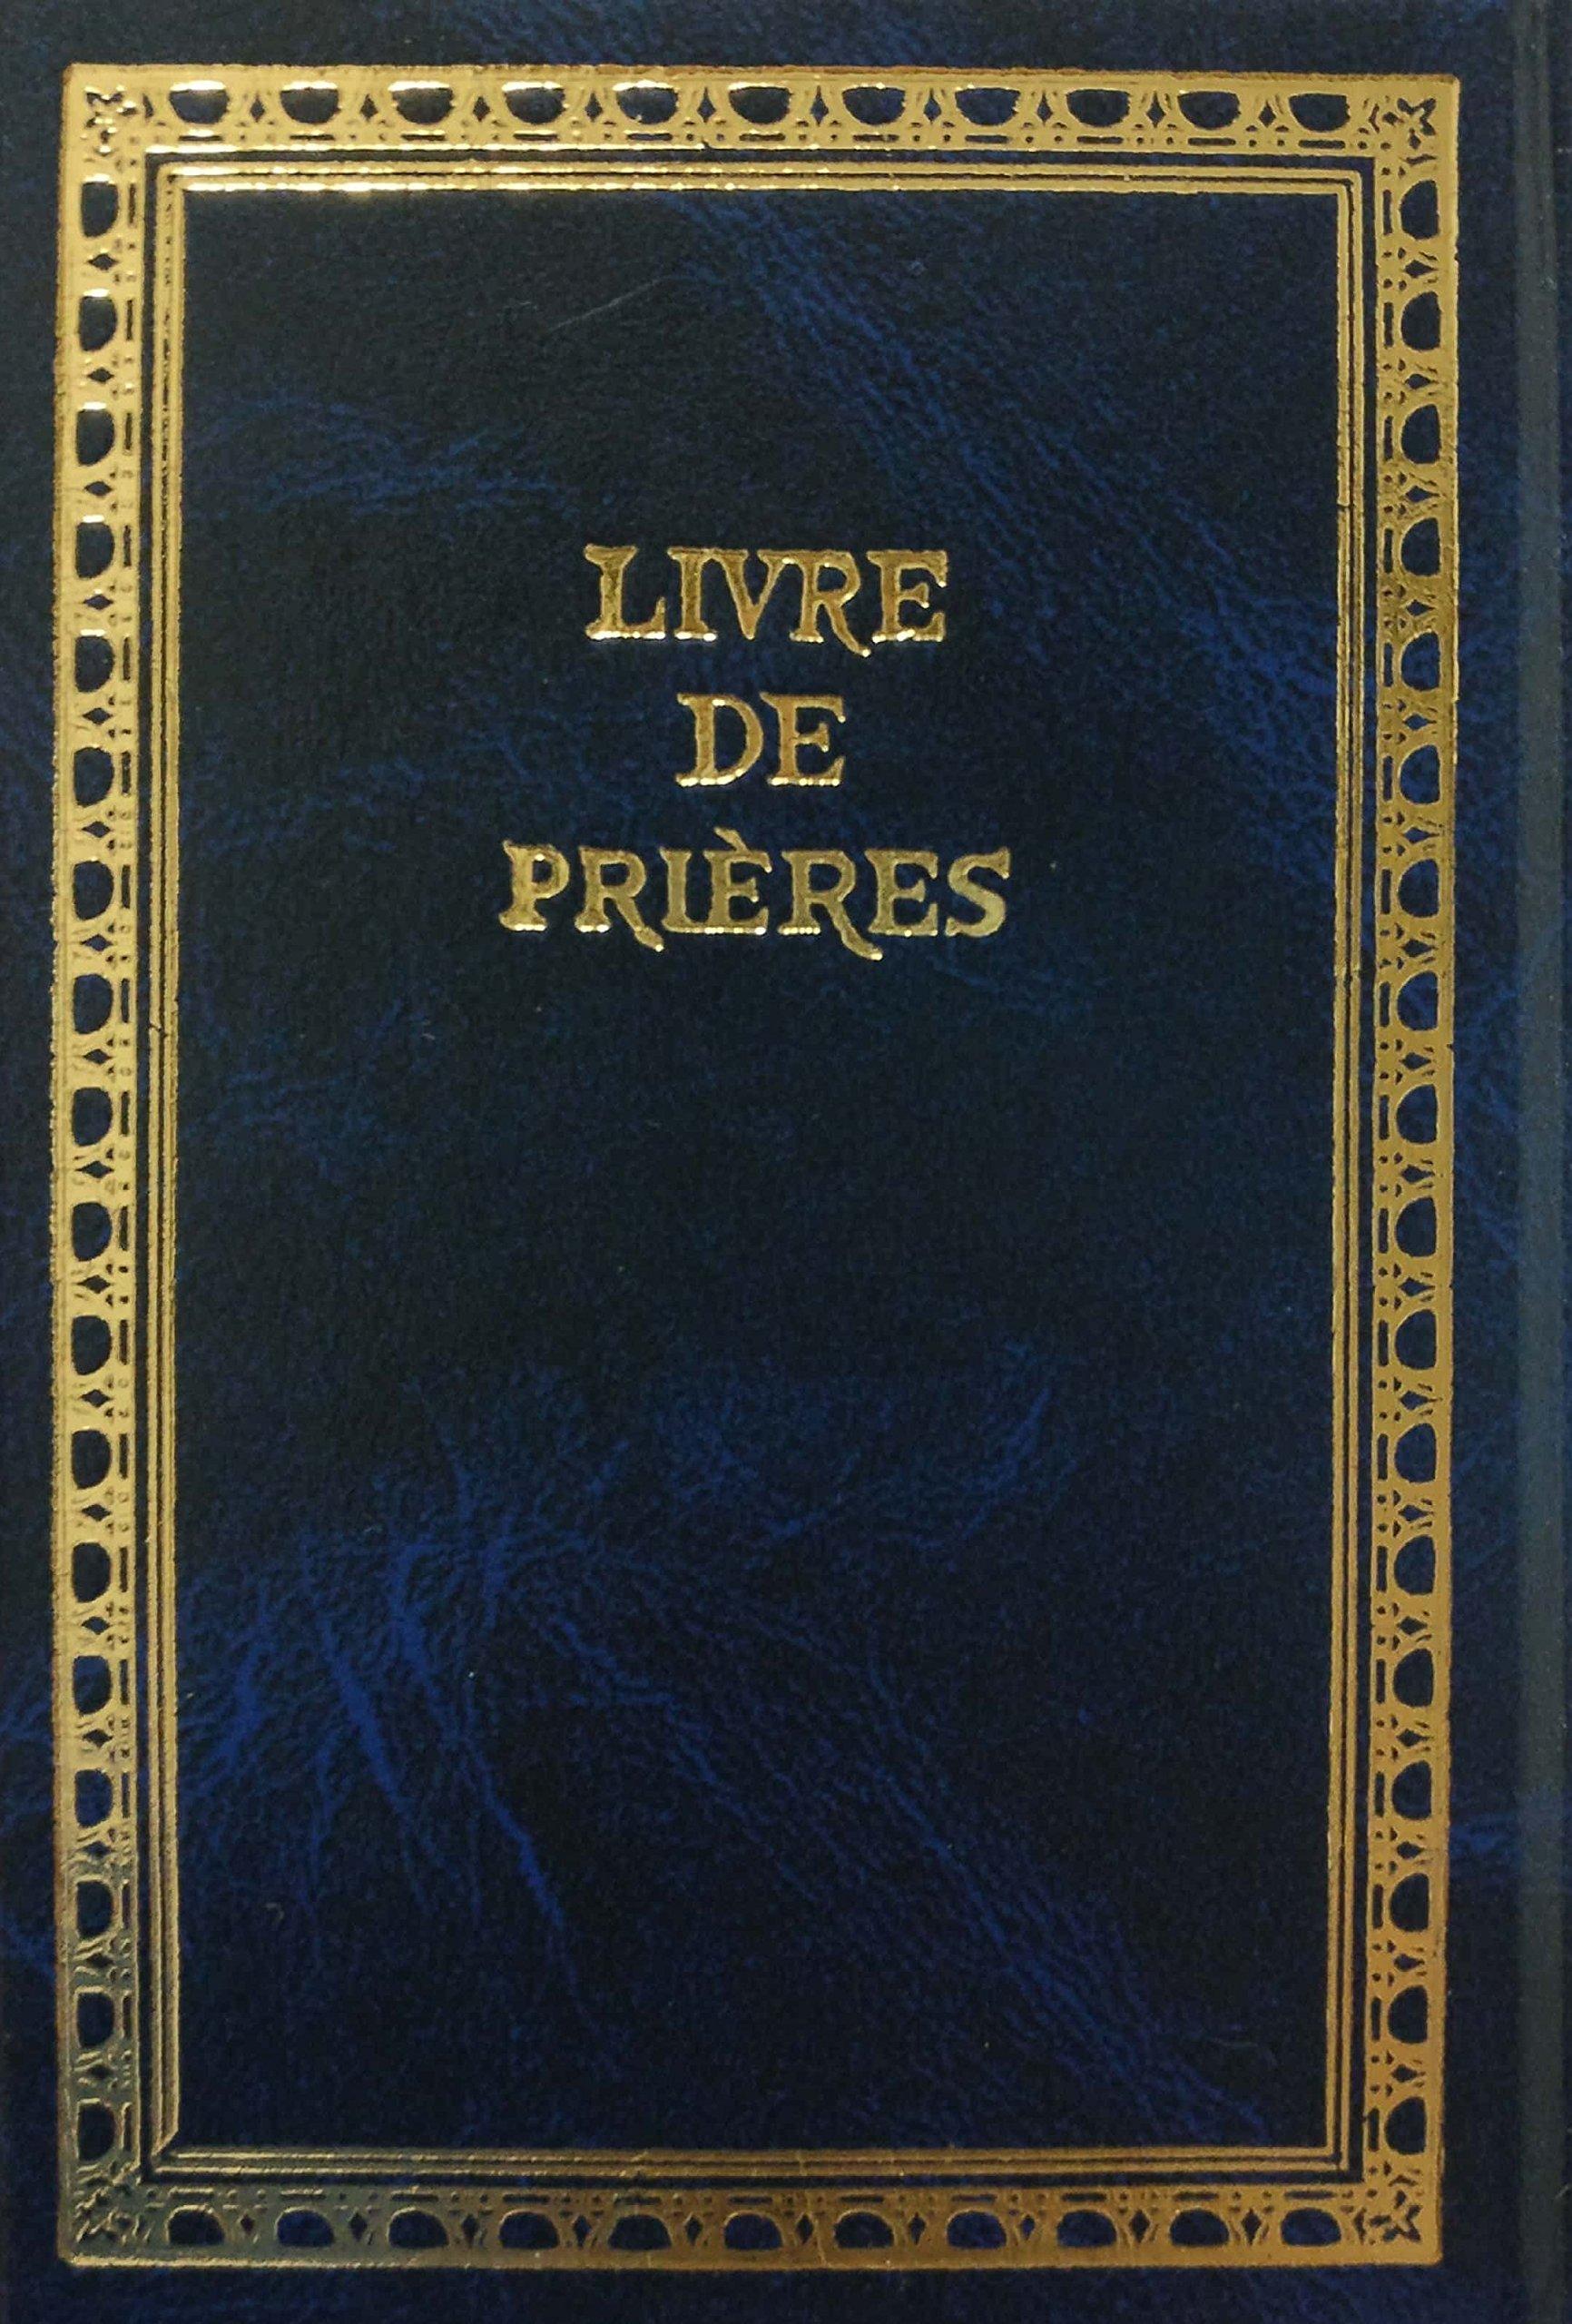 Livre De Prieres Siddur Avodat Israel With French Hebrew